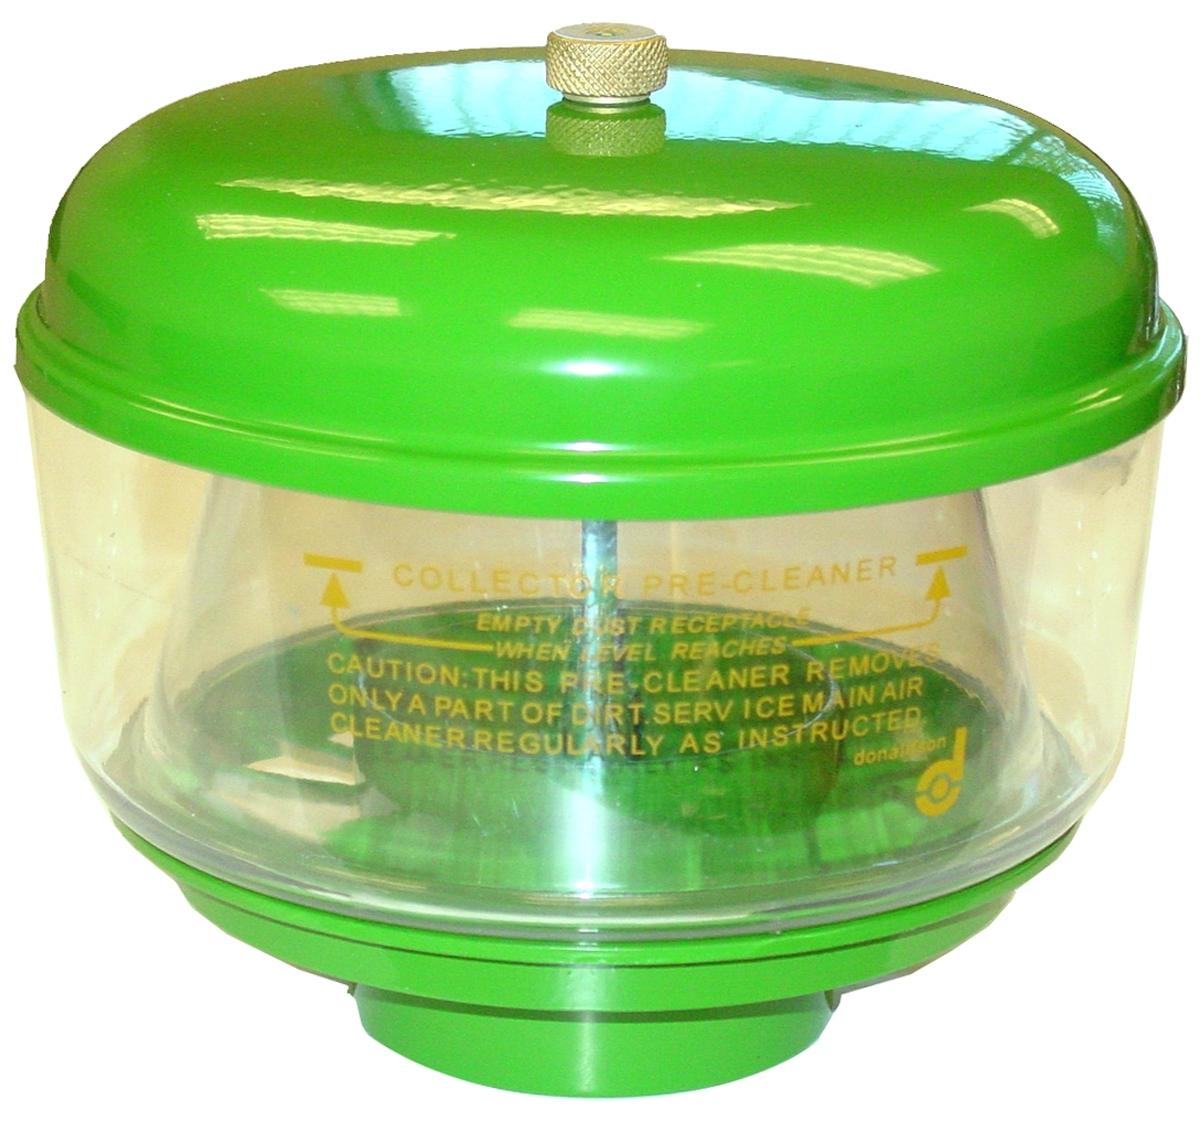 PRECLEANER KIT: LID W/NUT, PLASTIC BOWL, & METAL BASE